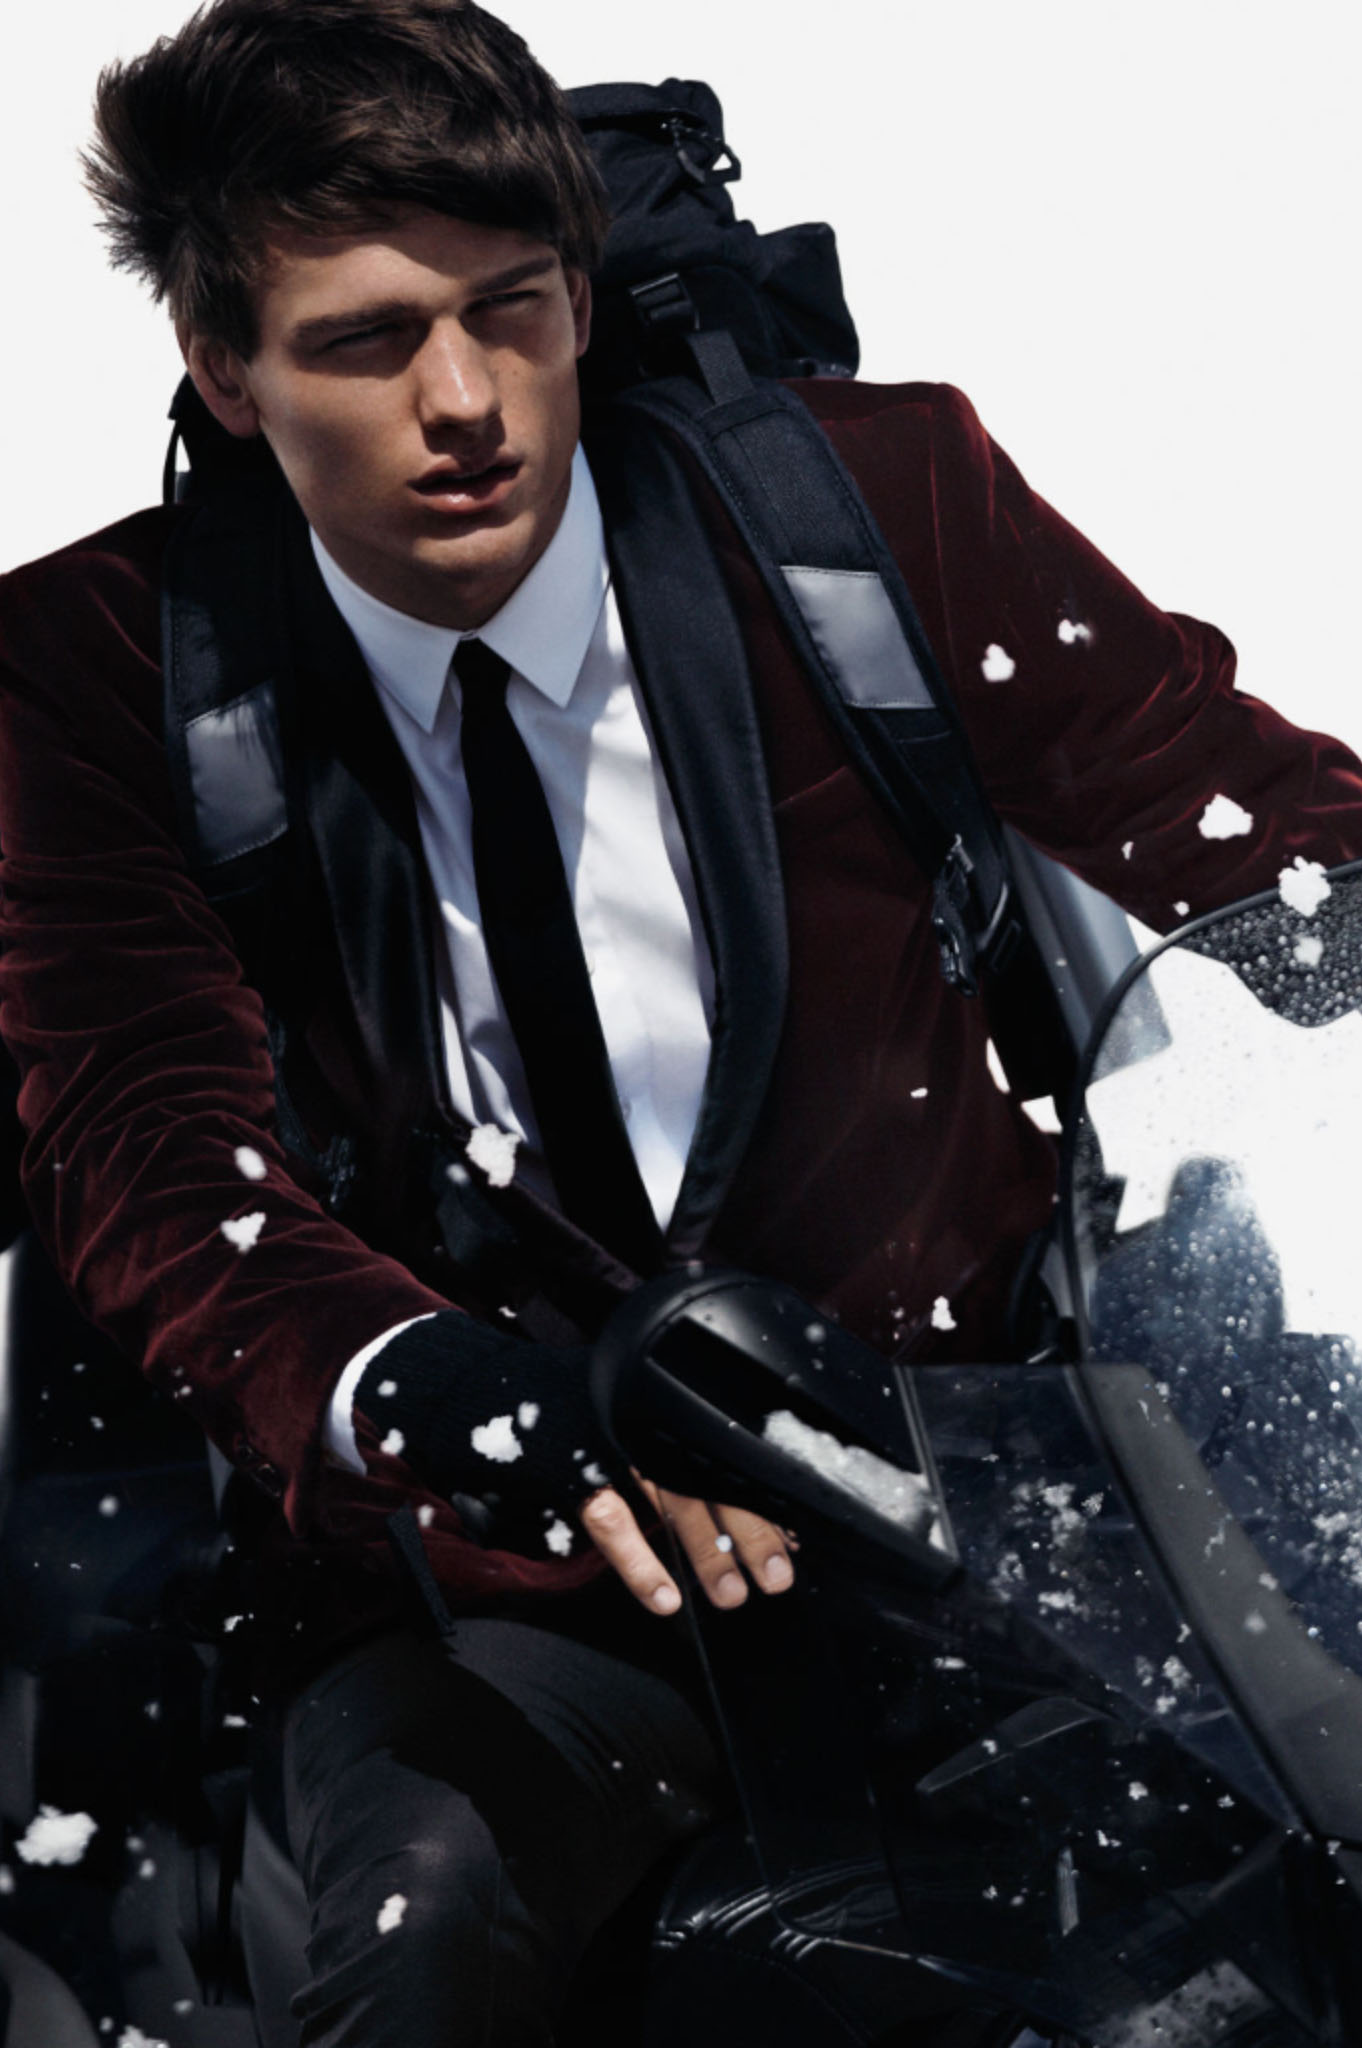 Simon Nessman Models H&M's Winter 2012 Looks